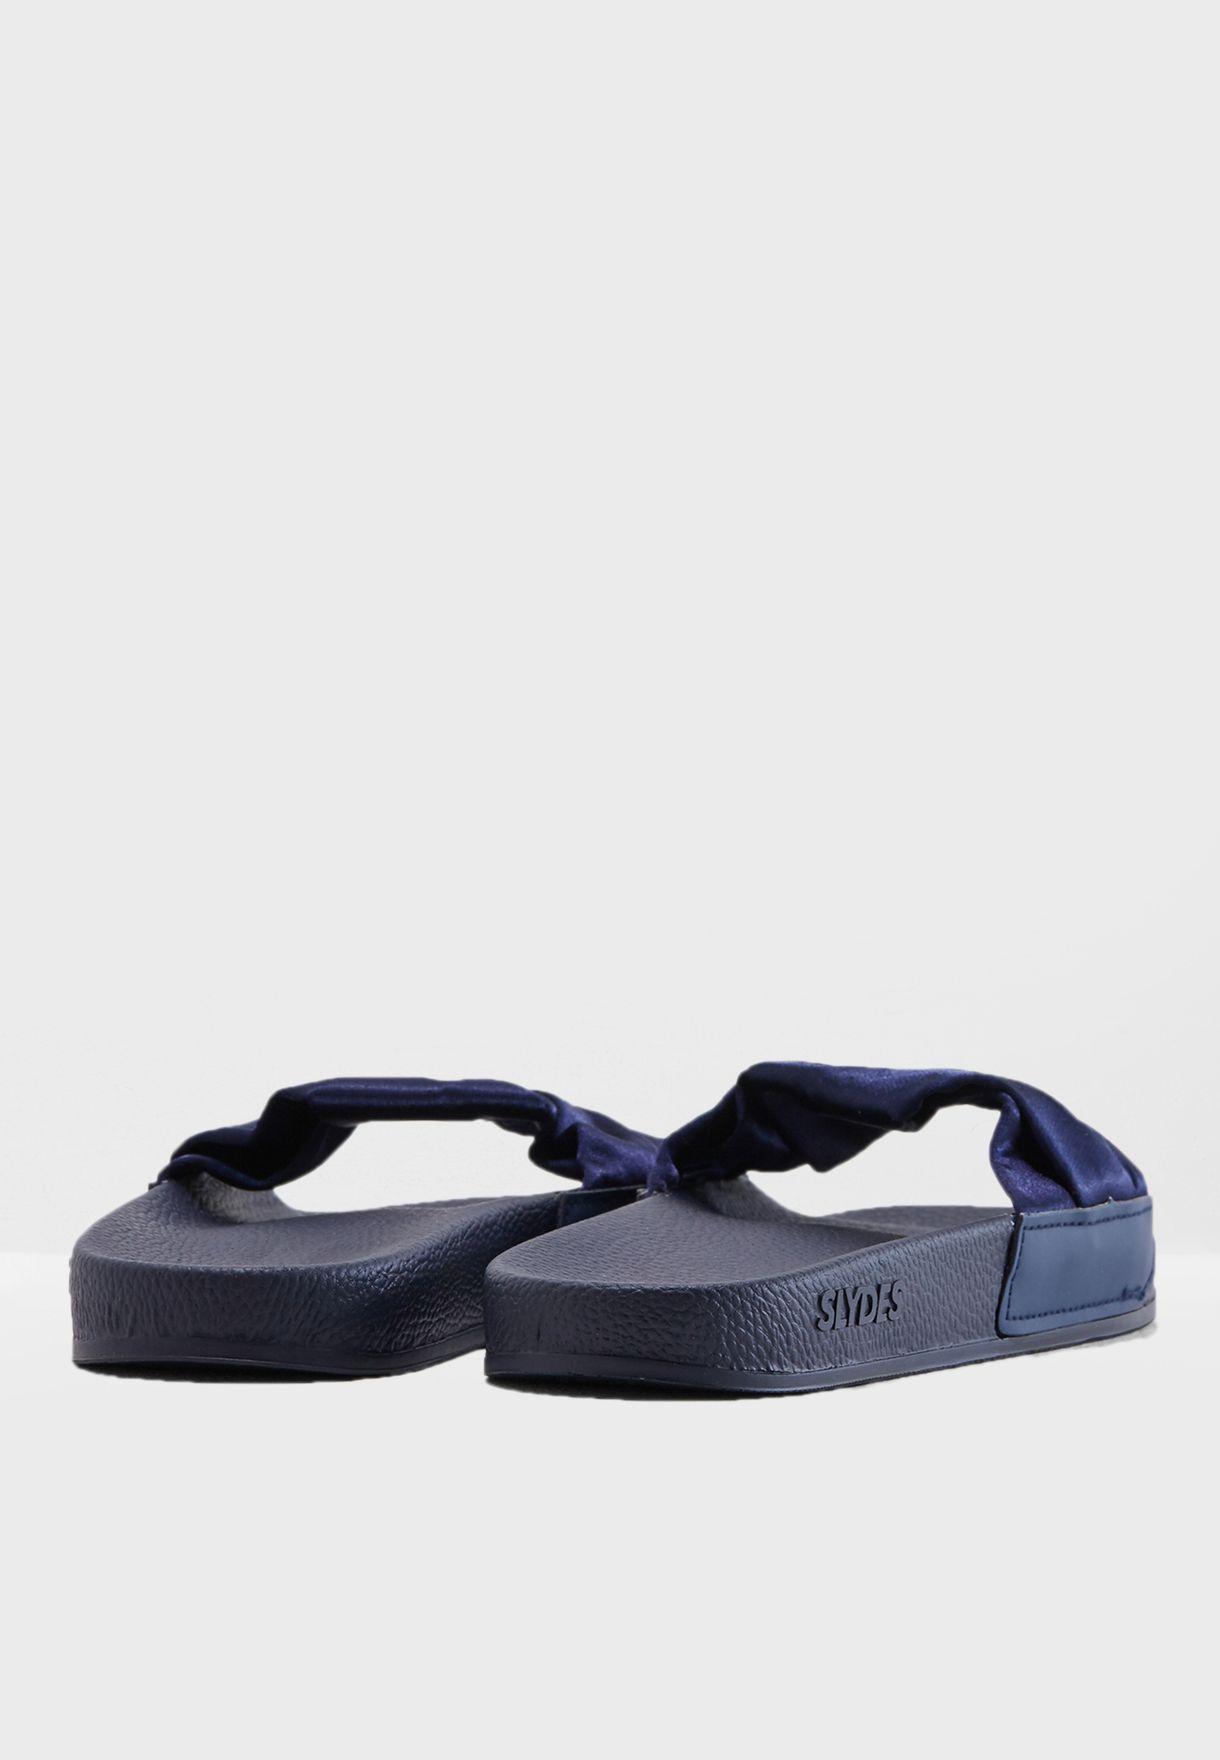 Dessa Casual Flat Sandal